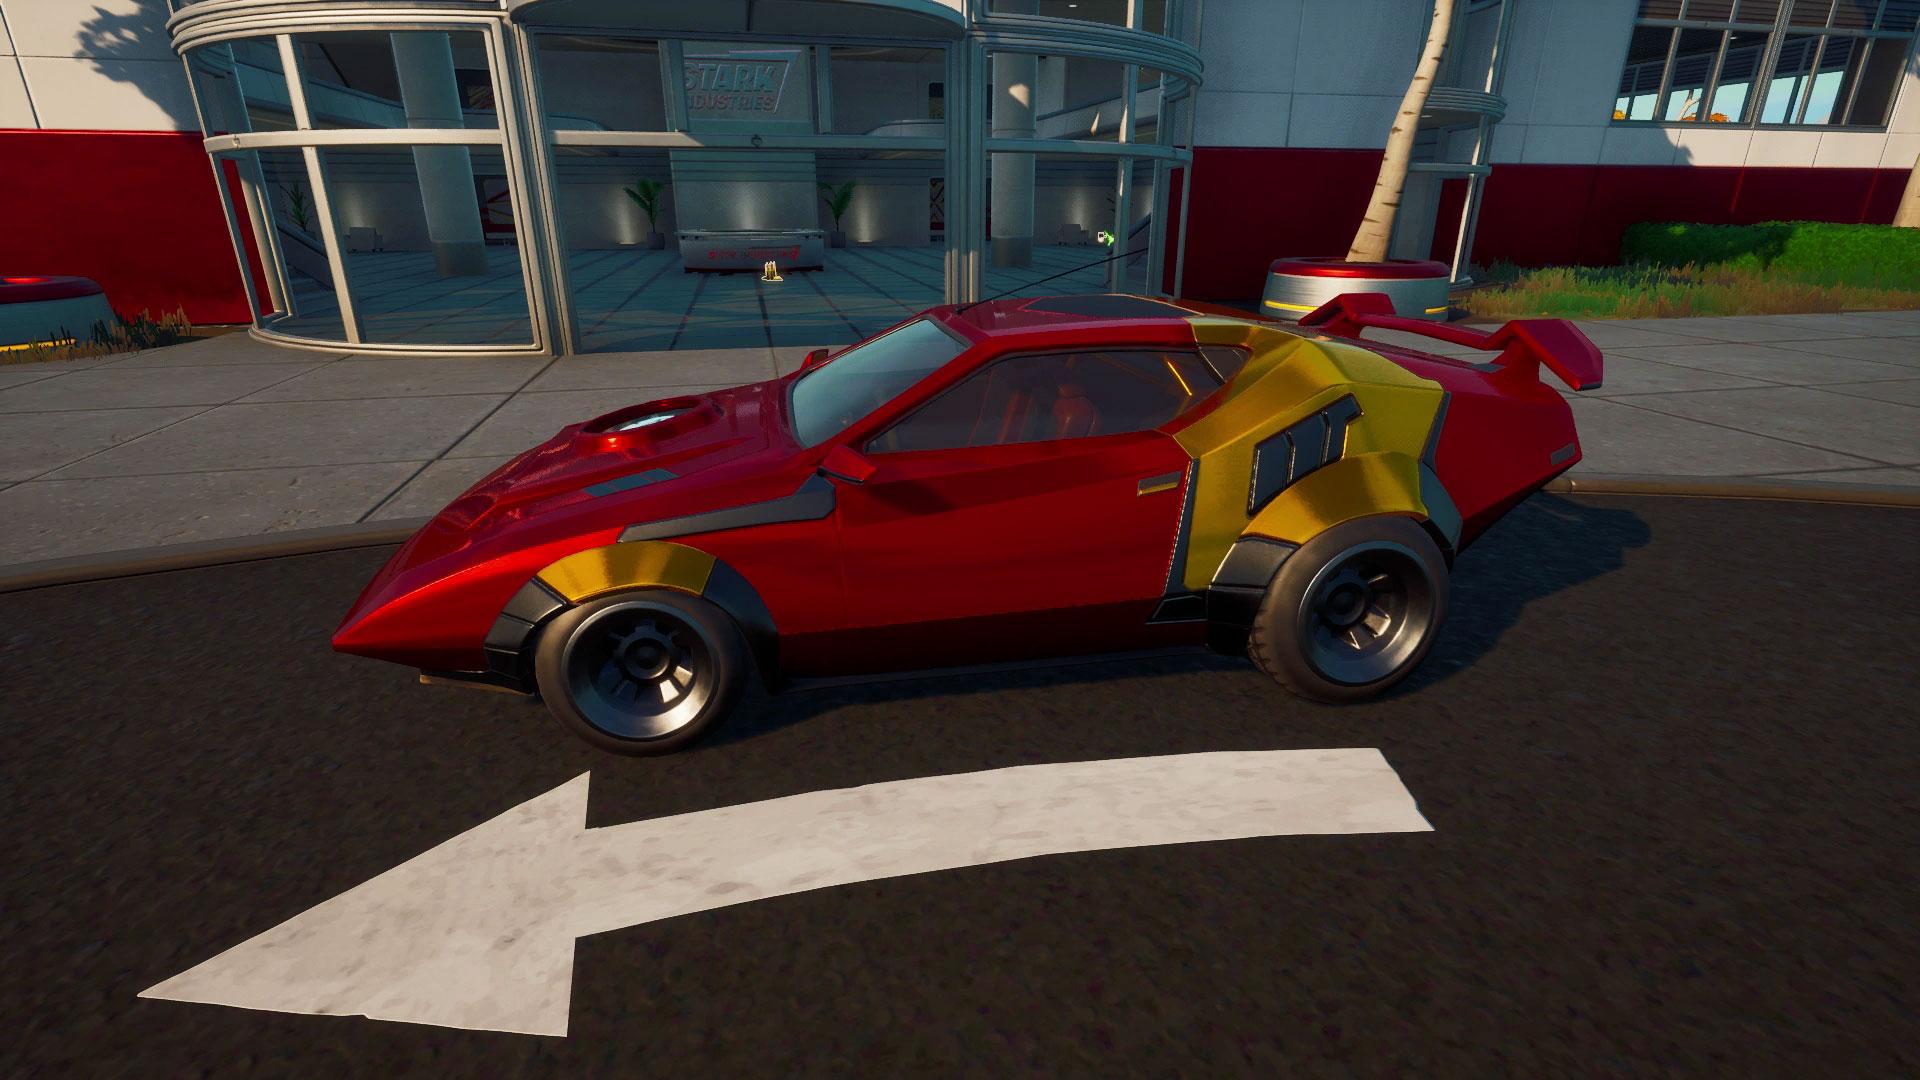 Fortnite Whiplash Locations How To Reach 88 On The Speedometer In A Whiplash As Tony Stark Gamesradar